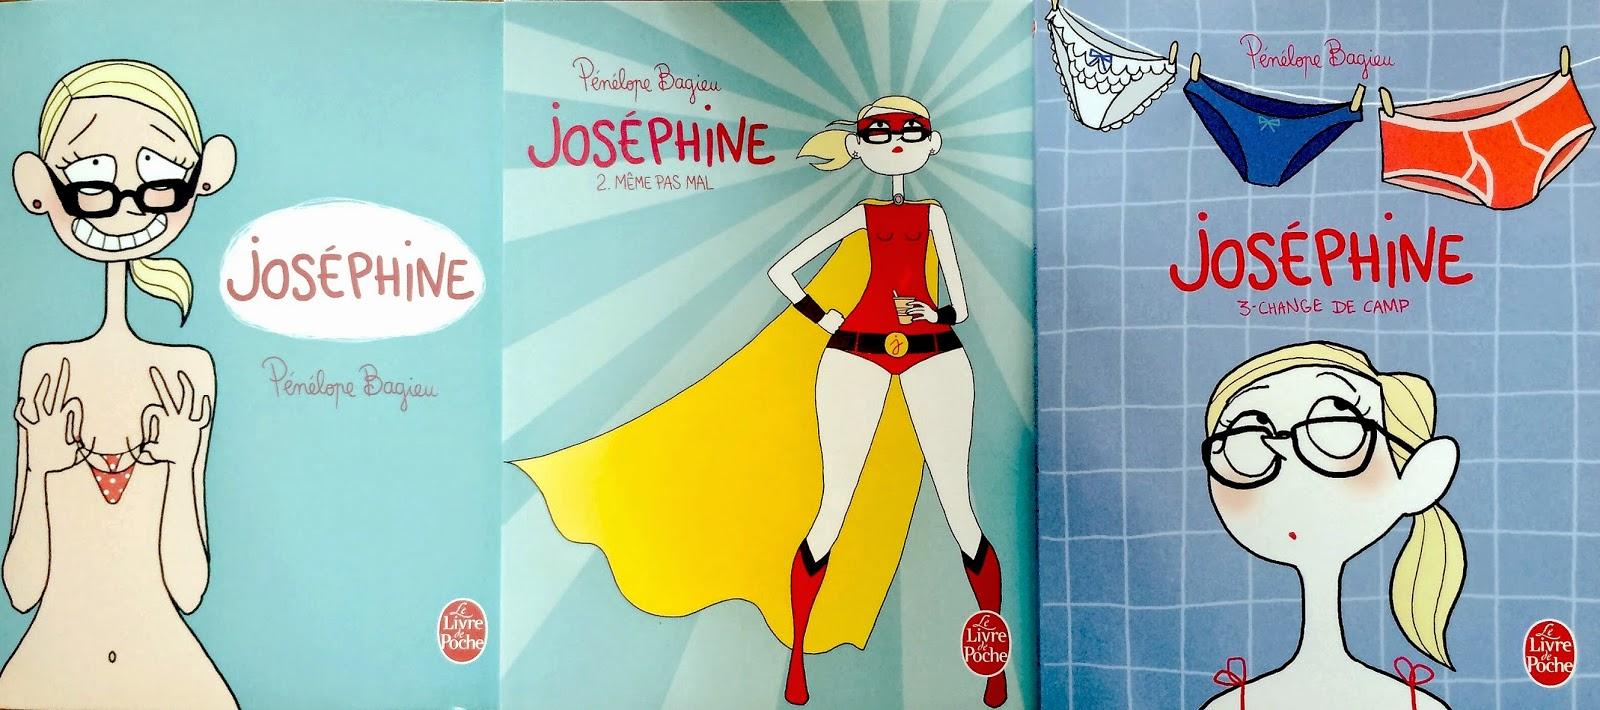 Cafe Chic Choc Blog o Francji książki Józefina francuska literatura